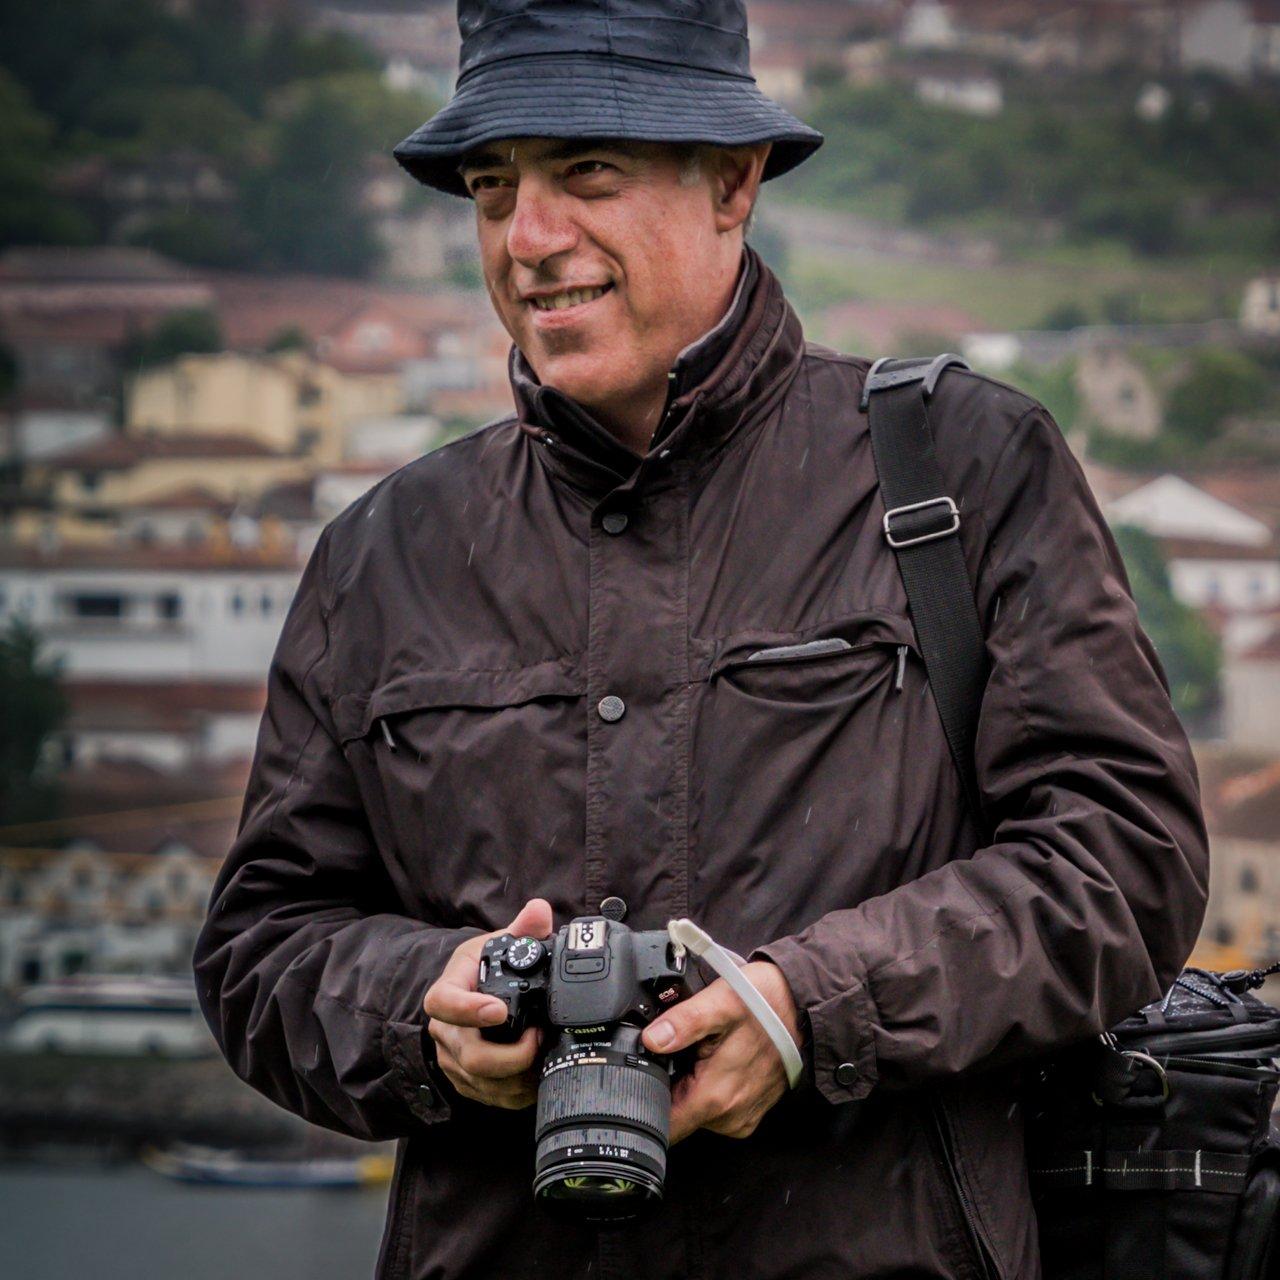 Jorge-Albuquerque-Pictury-Photo-Tours-Porto